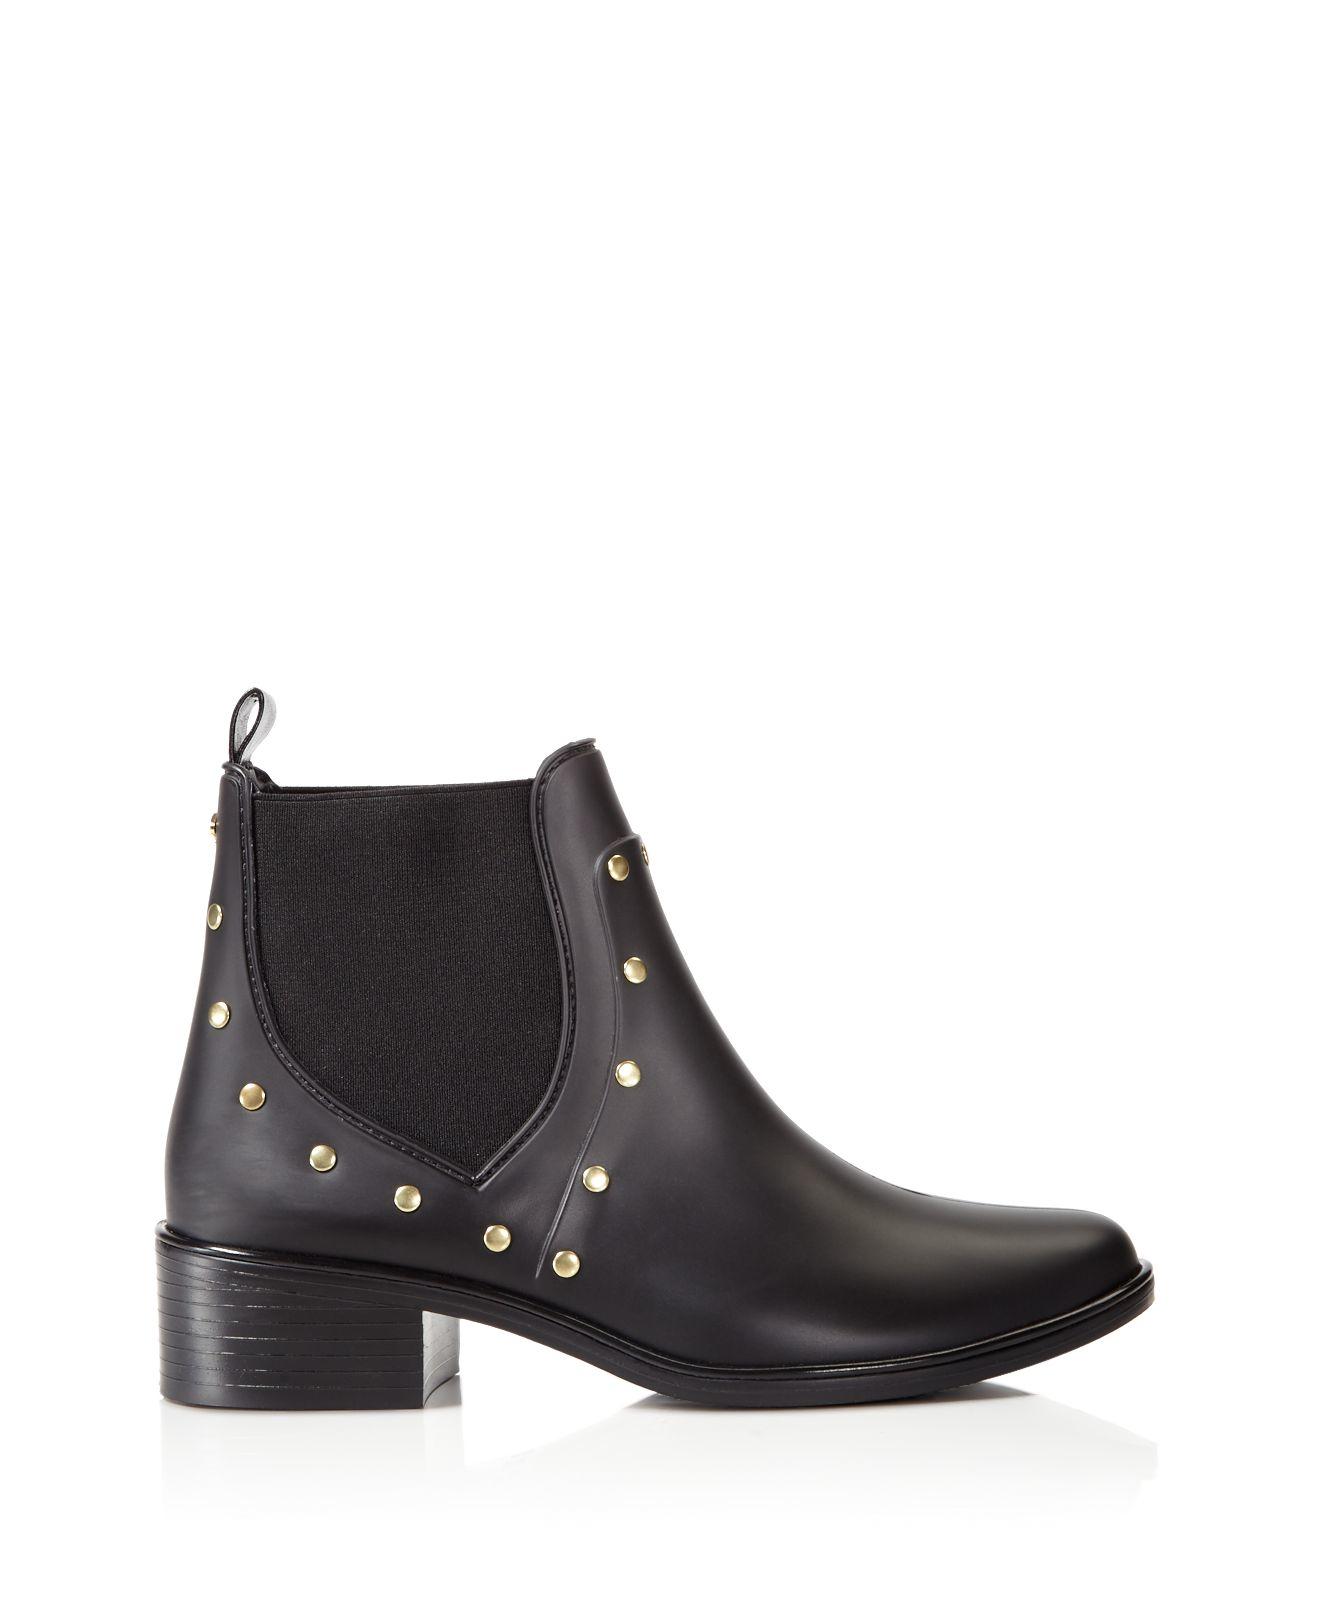 Kate Spade Rubber Salma Studded Rain Booties in Black